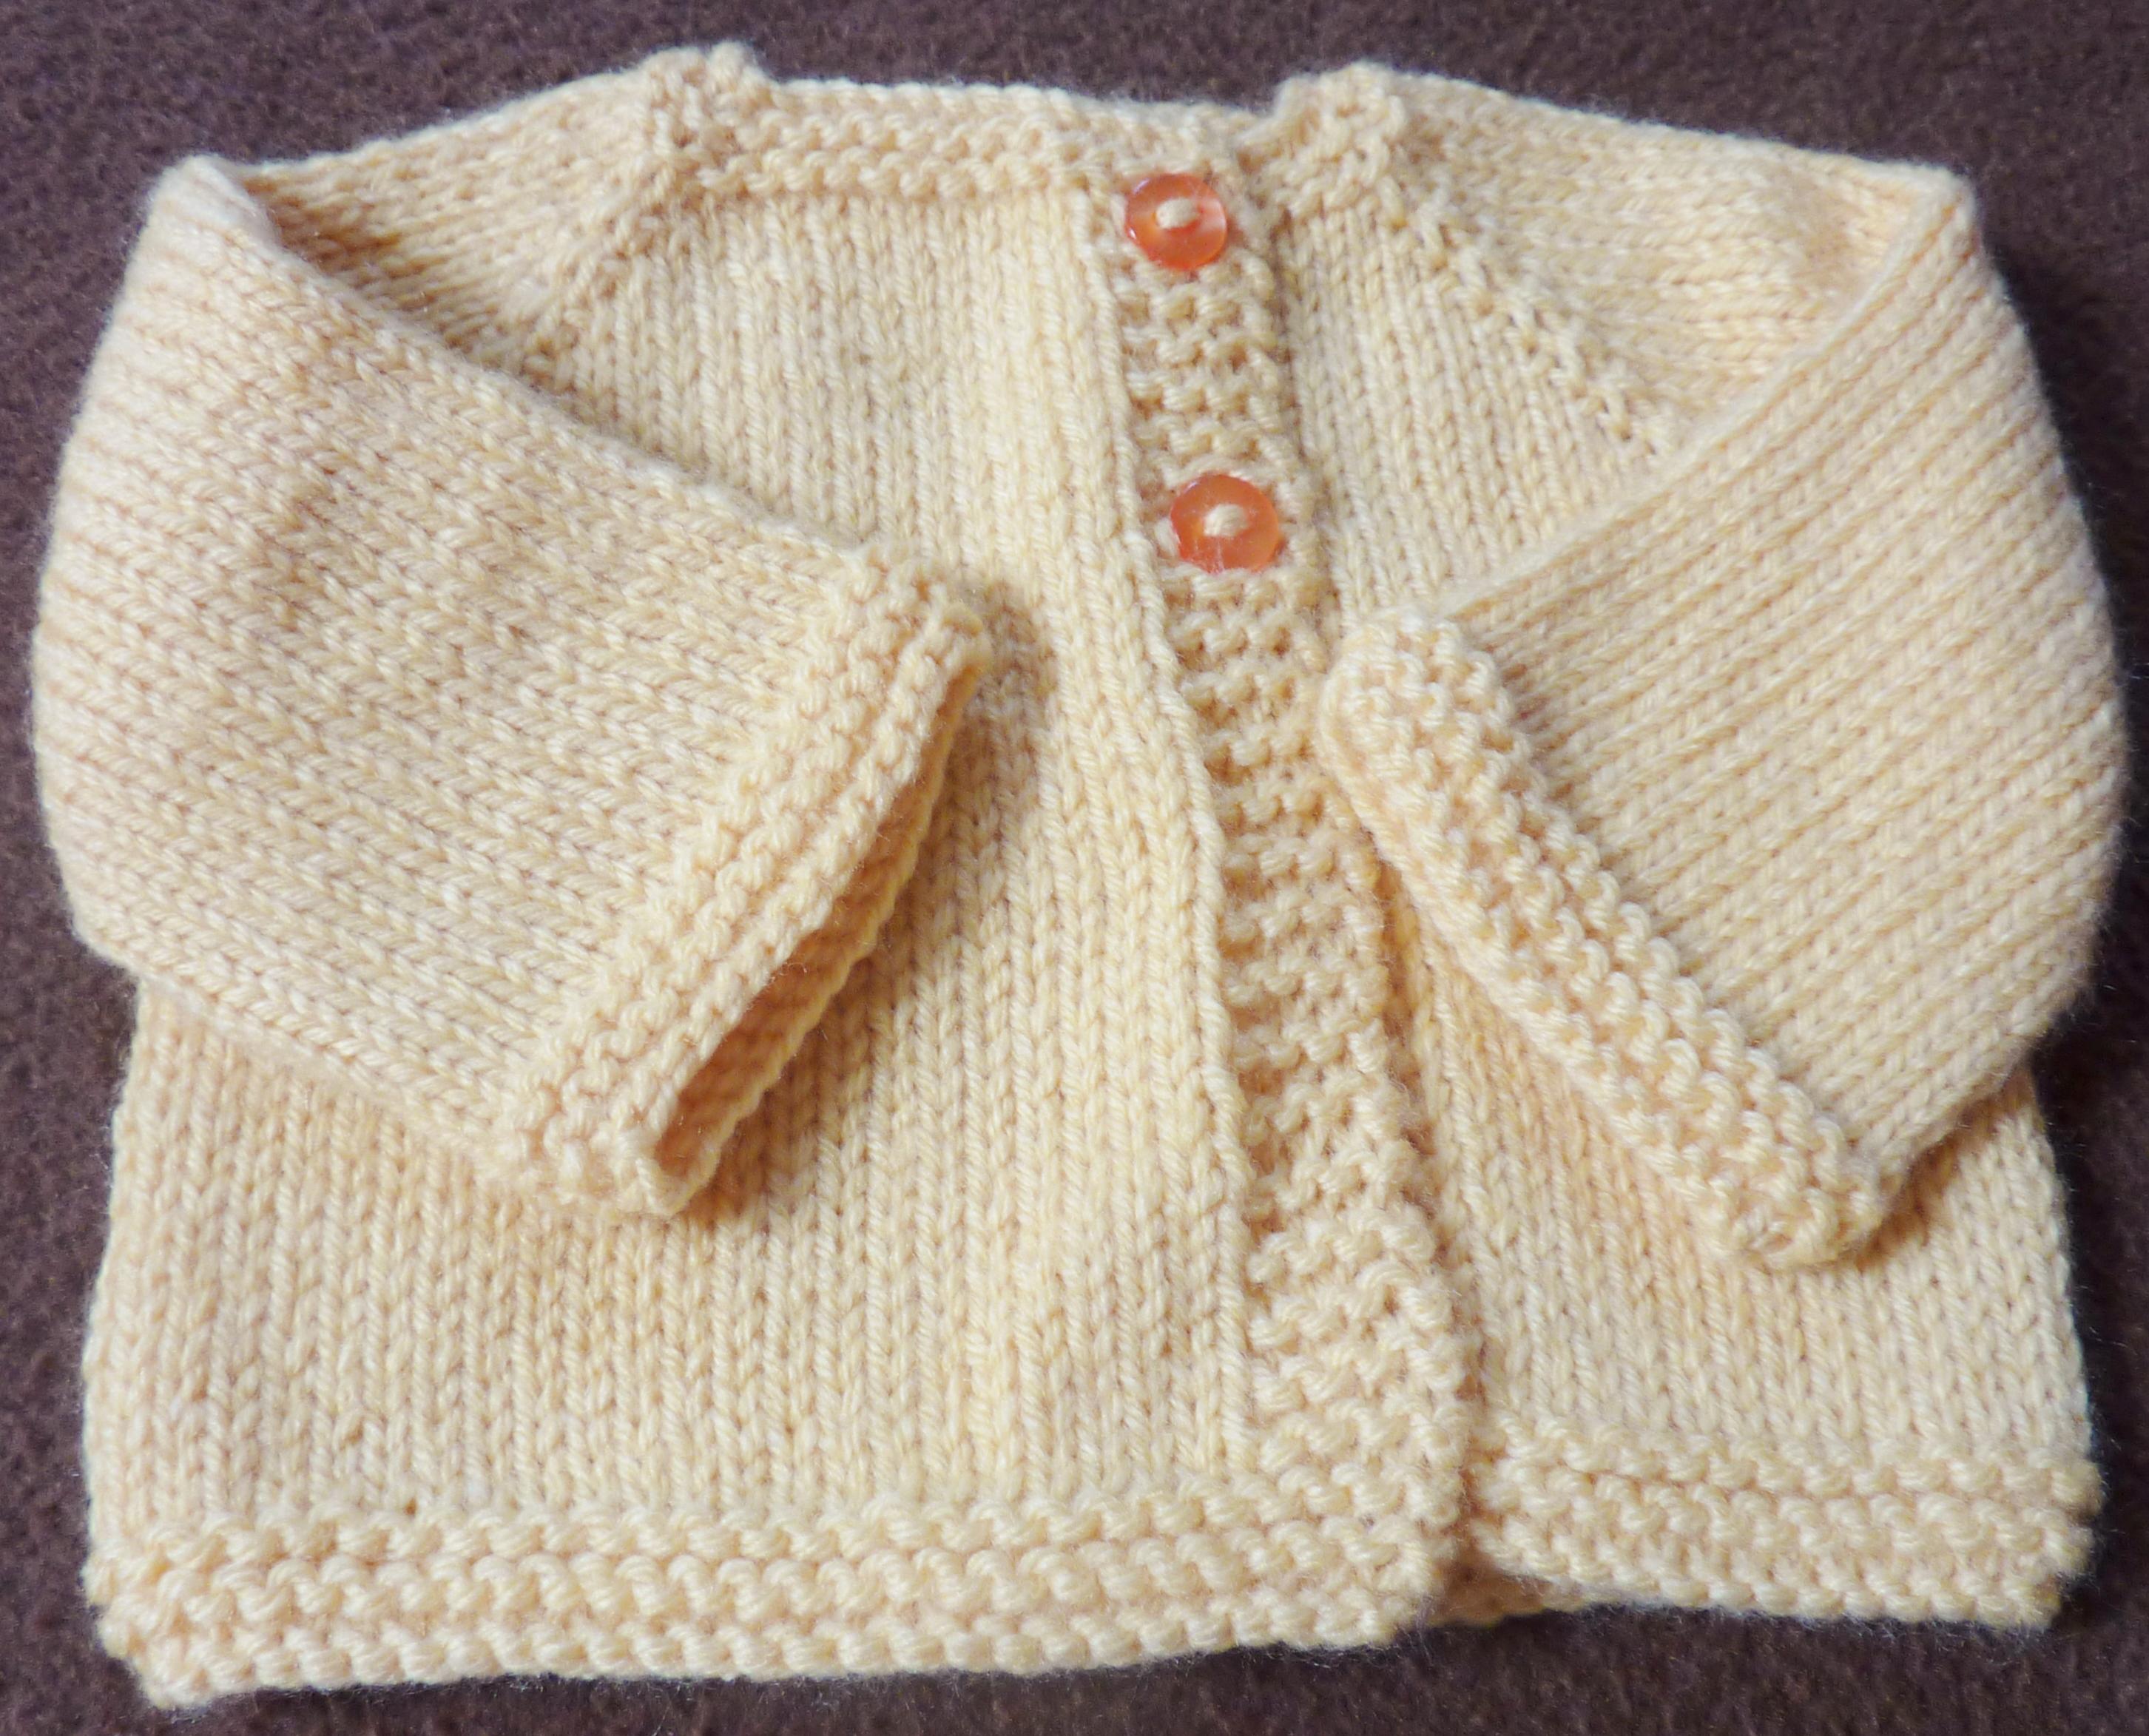 Knitting Websites Ireland : The purple and white knitting initiative for irish